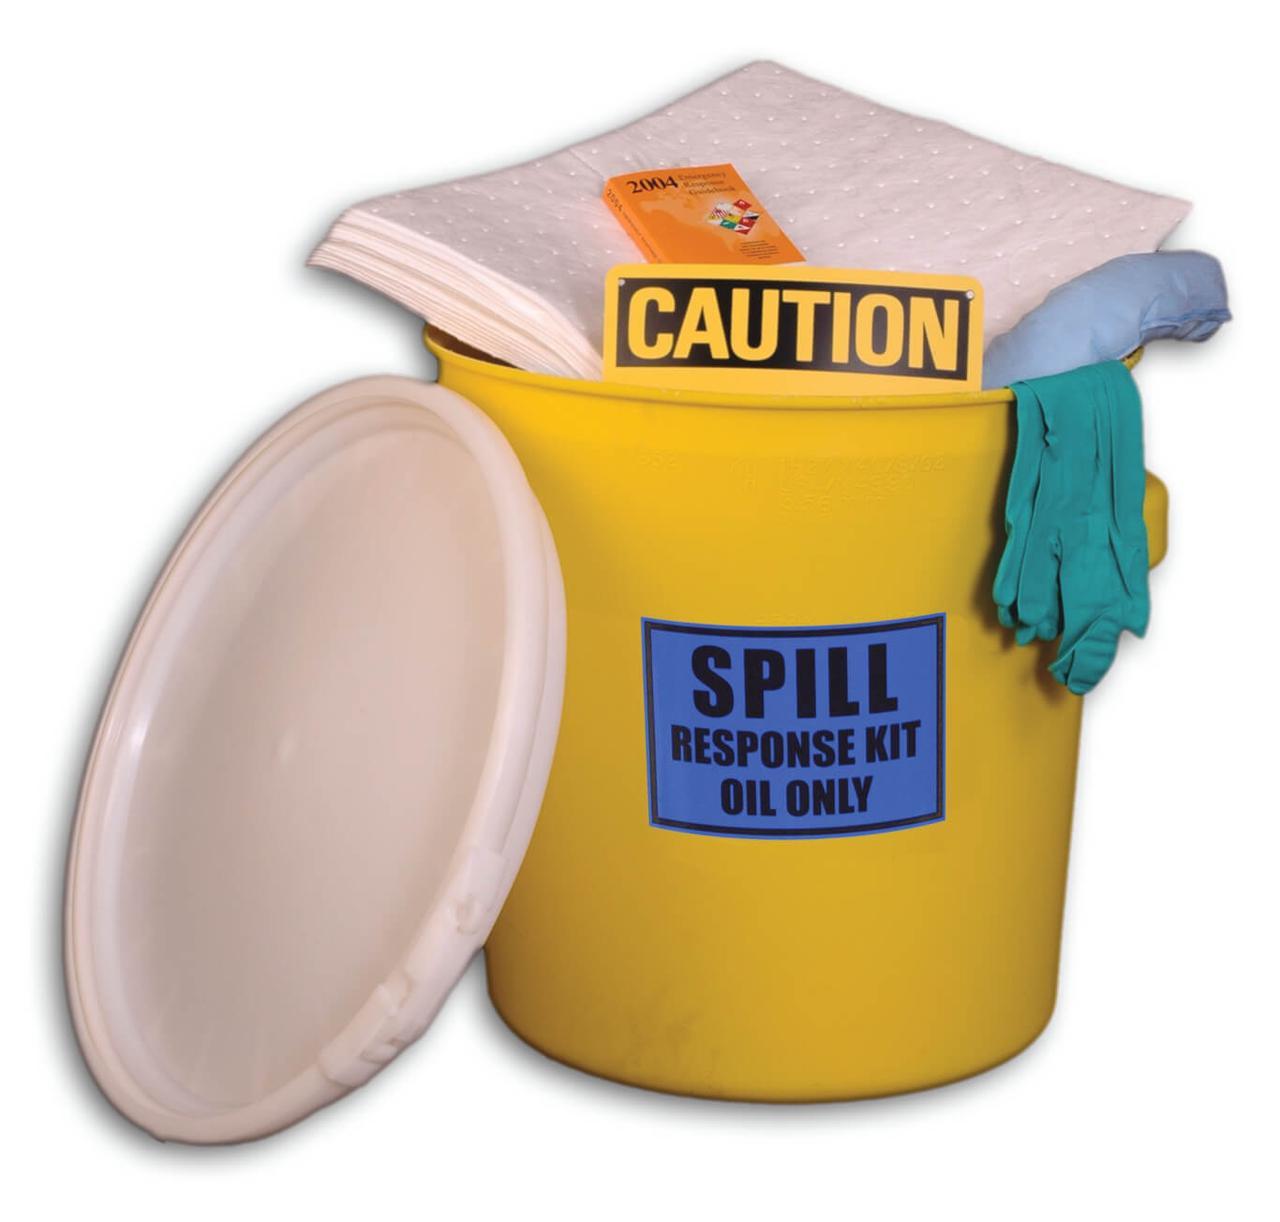 20-Gal Spill Kit Набор для сбора разливов масла, химических и технических жидкостей